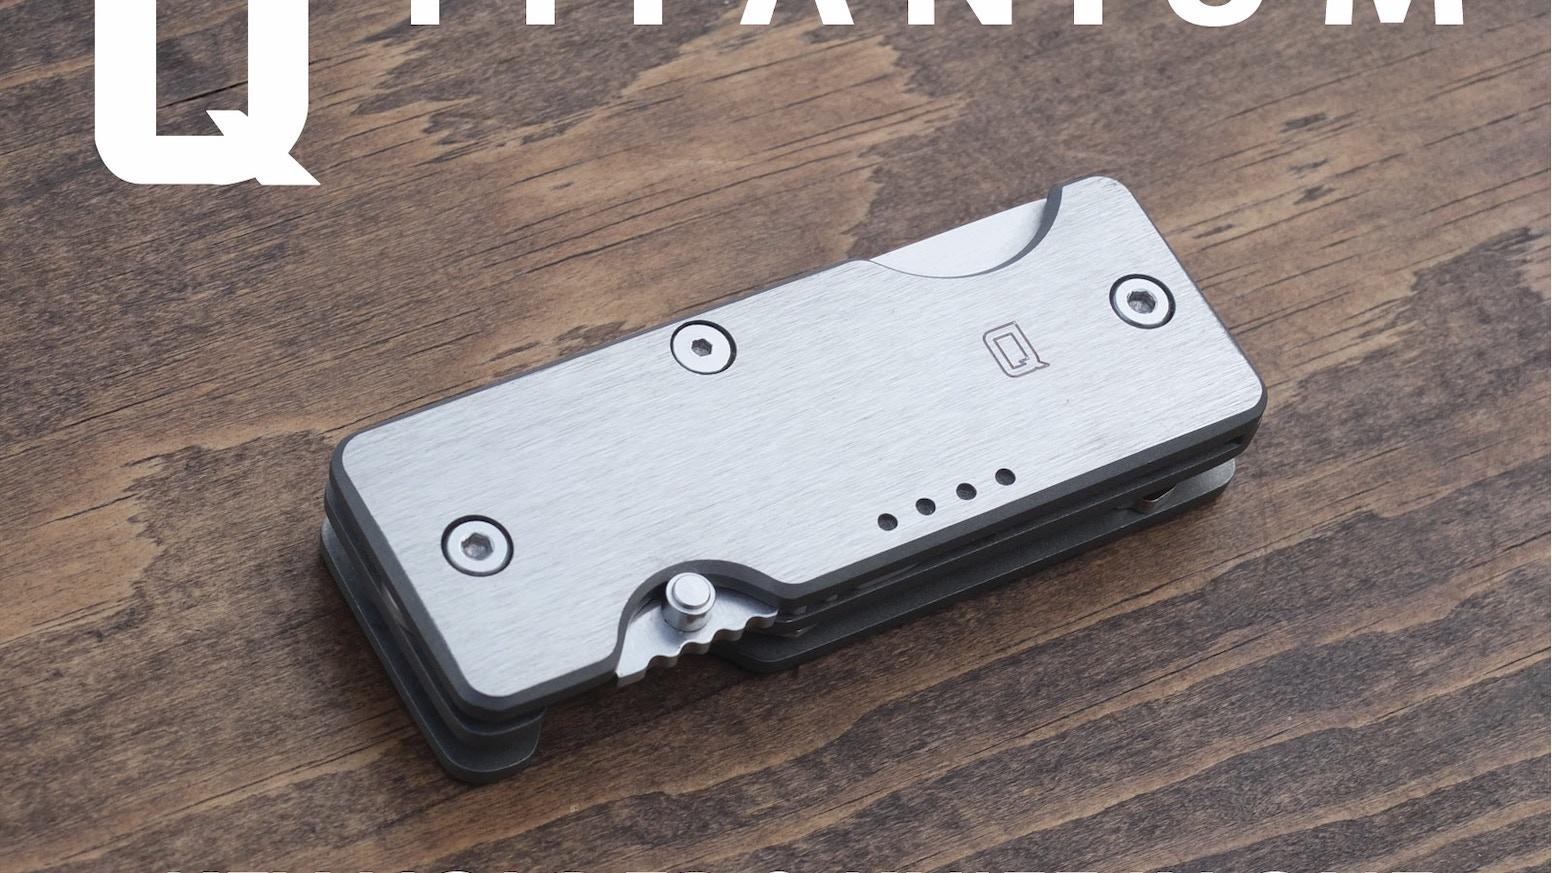 The key organizer just revolutionized itself - the ultimate key organizer &  locking knife in one